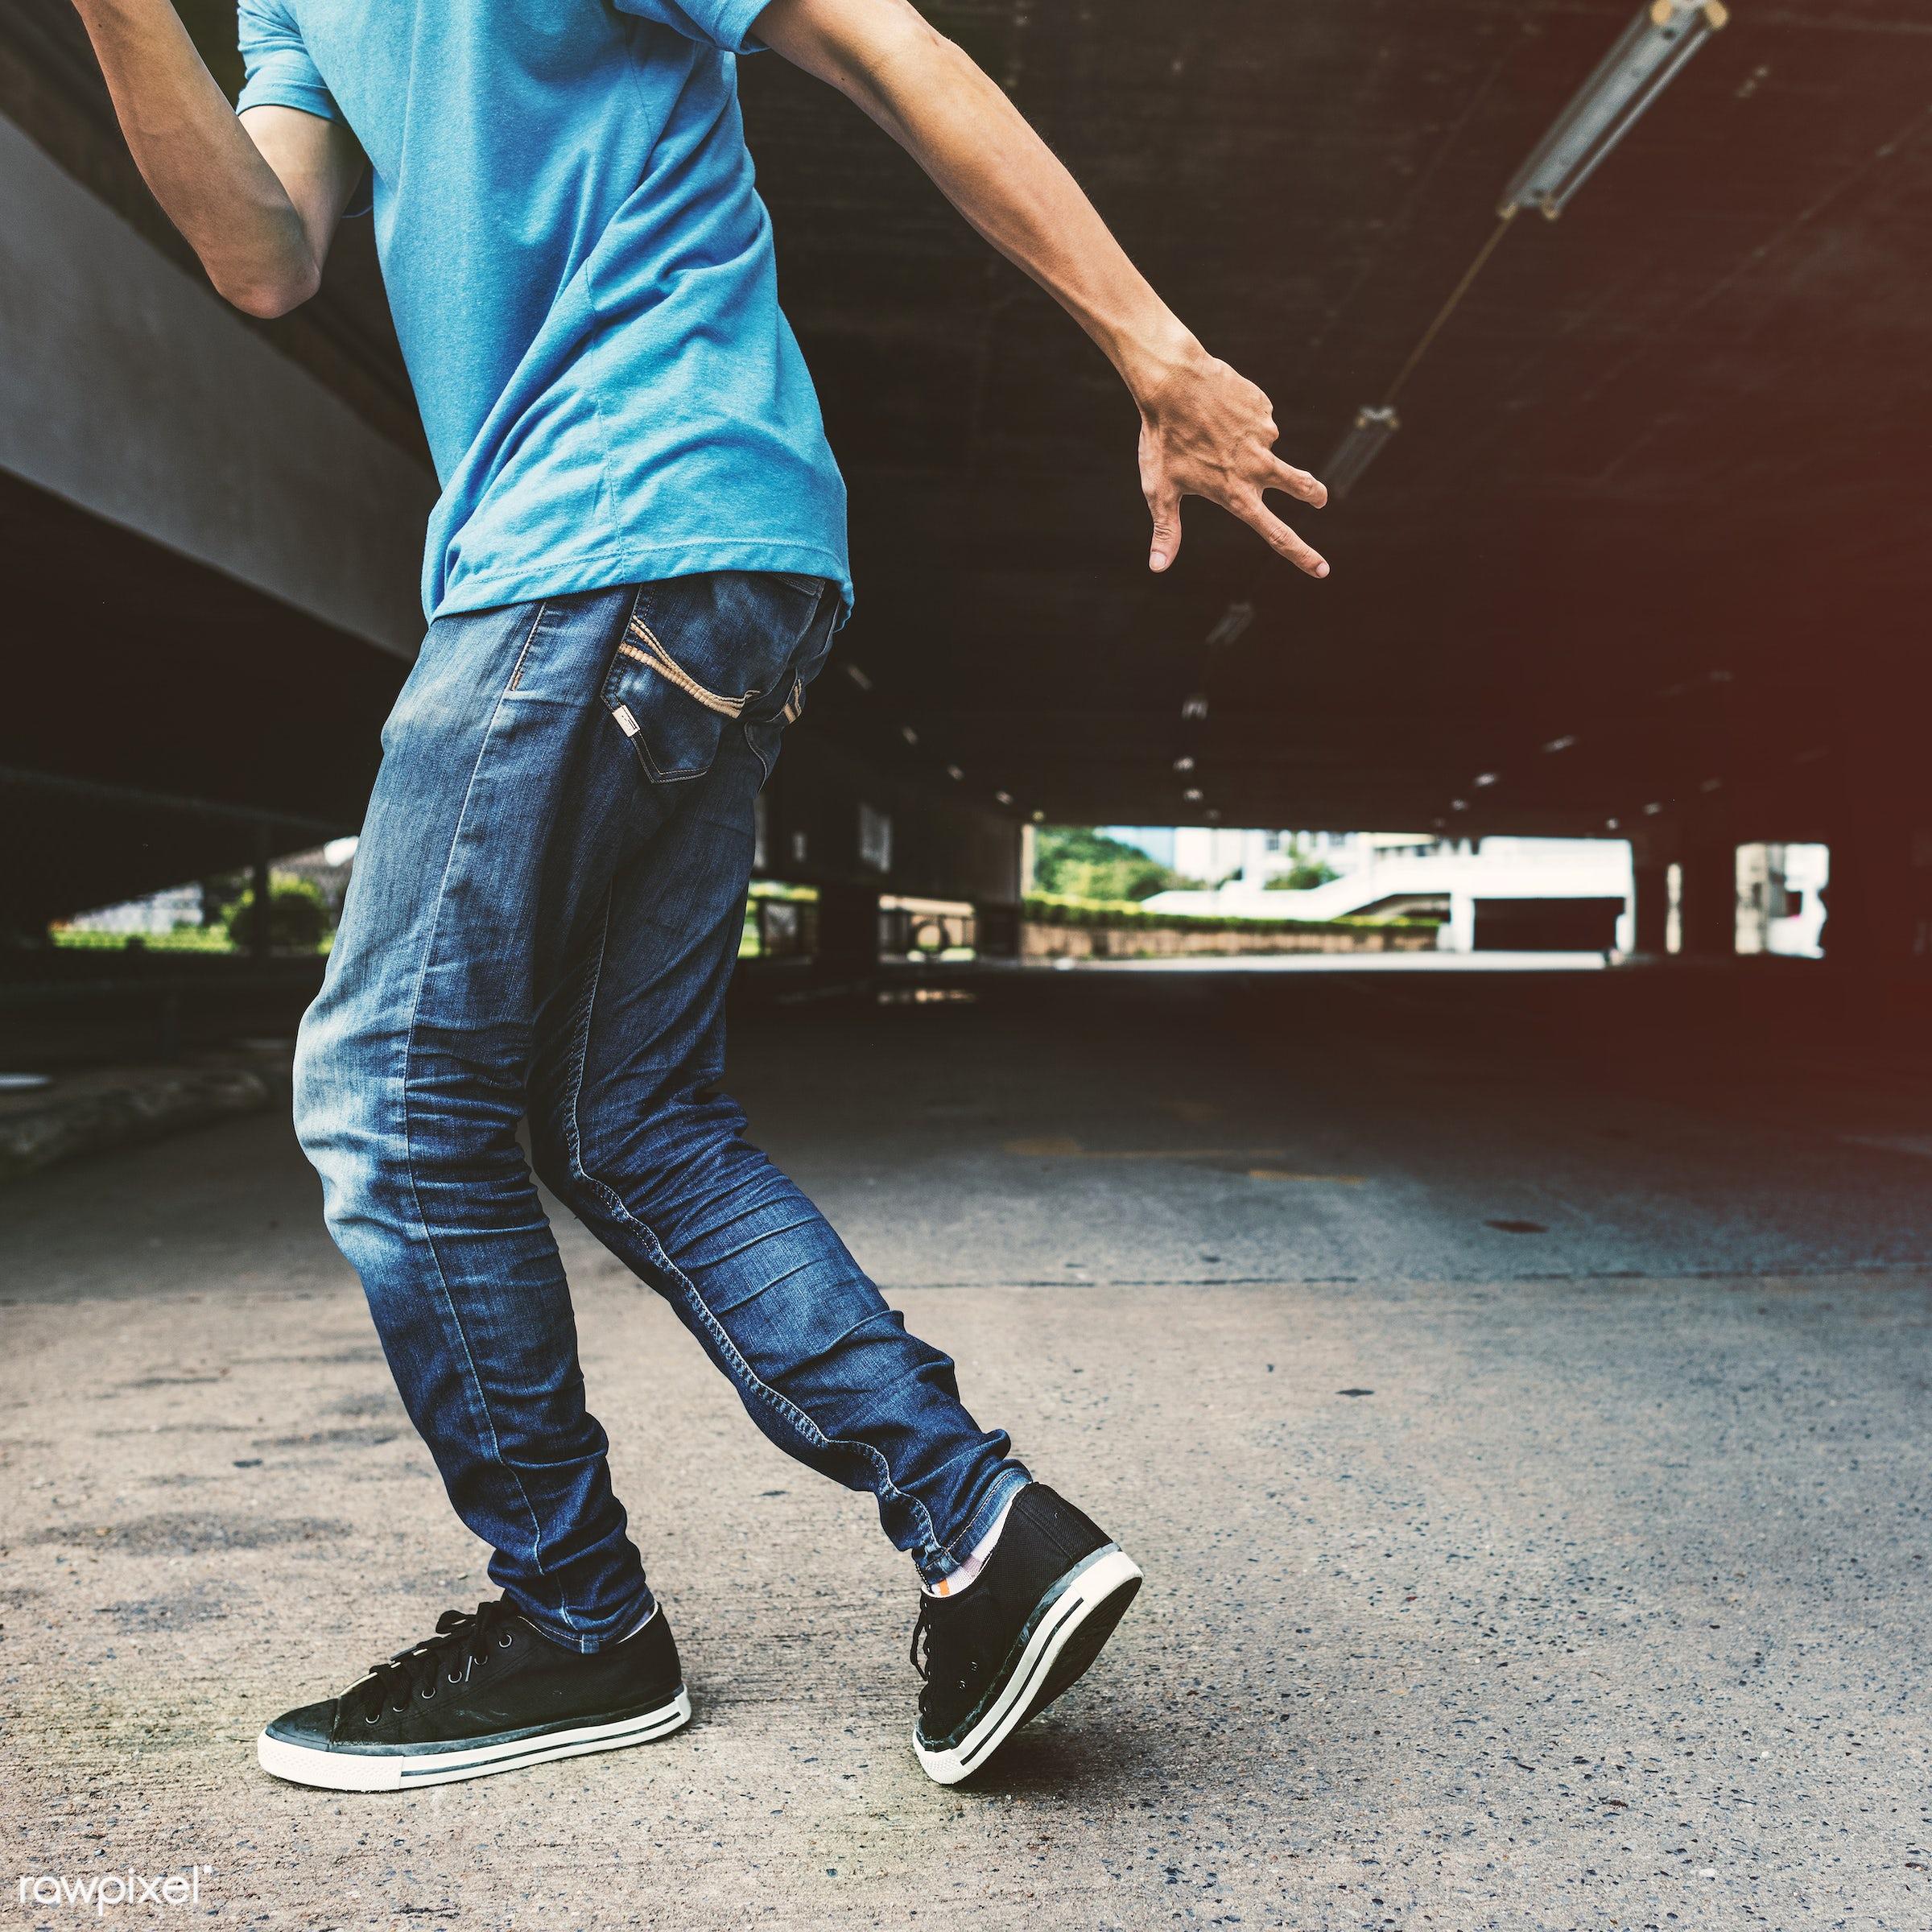 Young man breakdancing - dance, urban, asian, dancer, action, attractive, b-boy, b-boying, boy, break, break dancer, break...